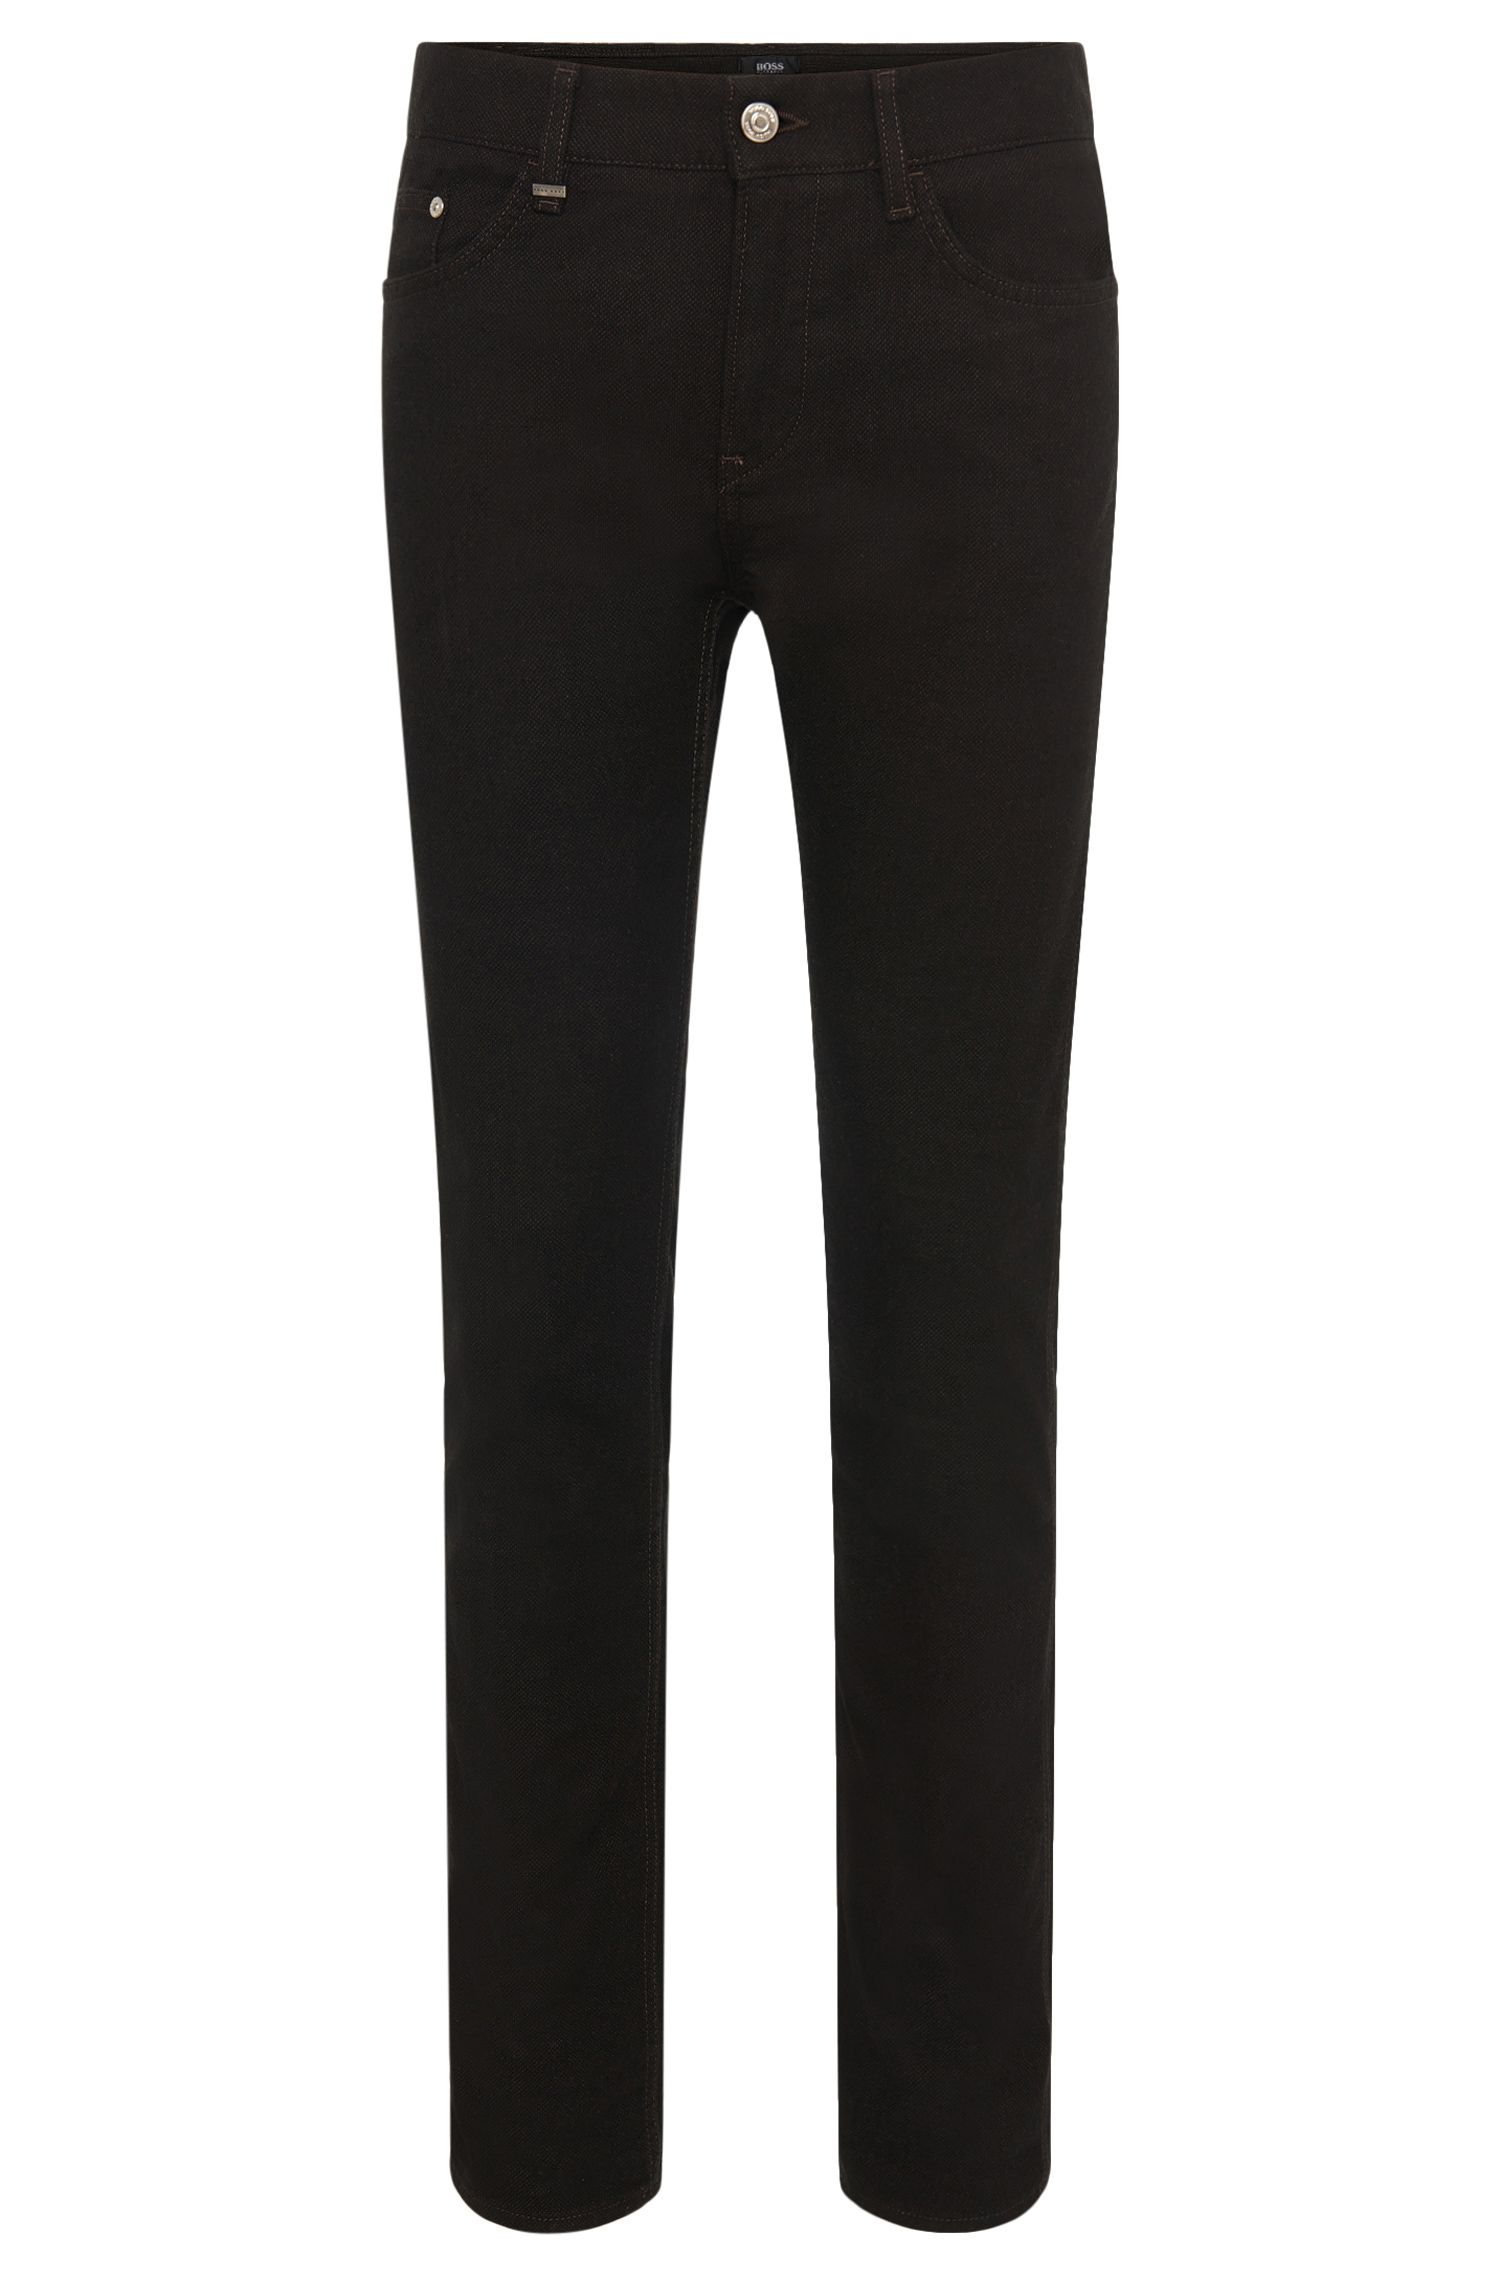 'Delaware' | Slim Fit, 13.5 oz Stretch Cotton Blend Birdseye Trousers